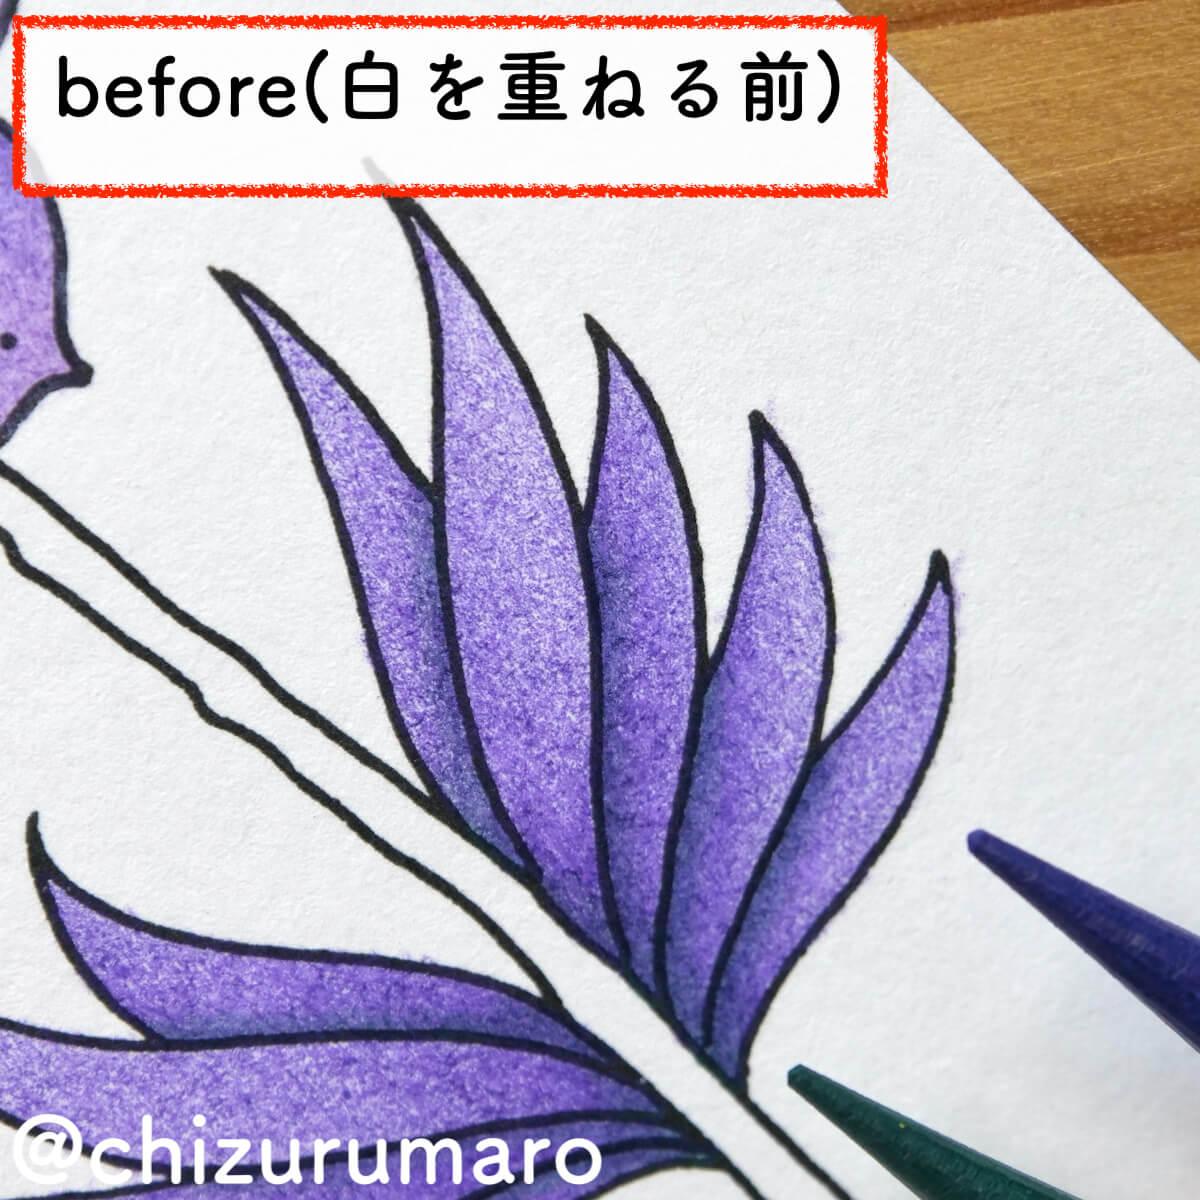 f:id:chizurumaro:20210805154903j:plain